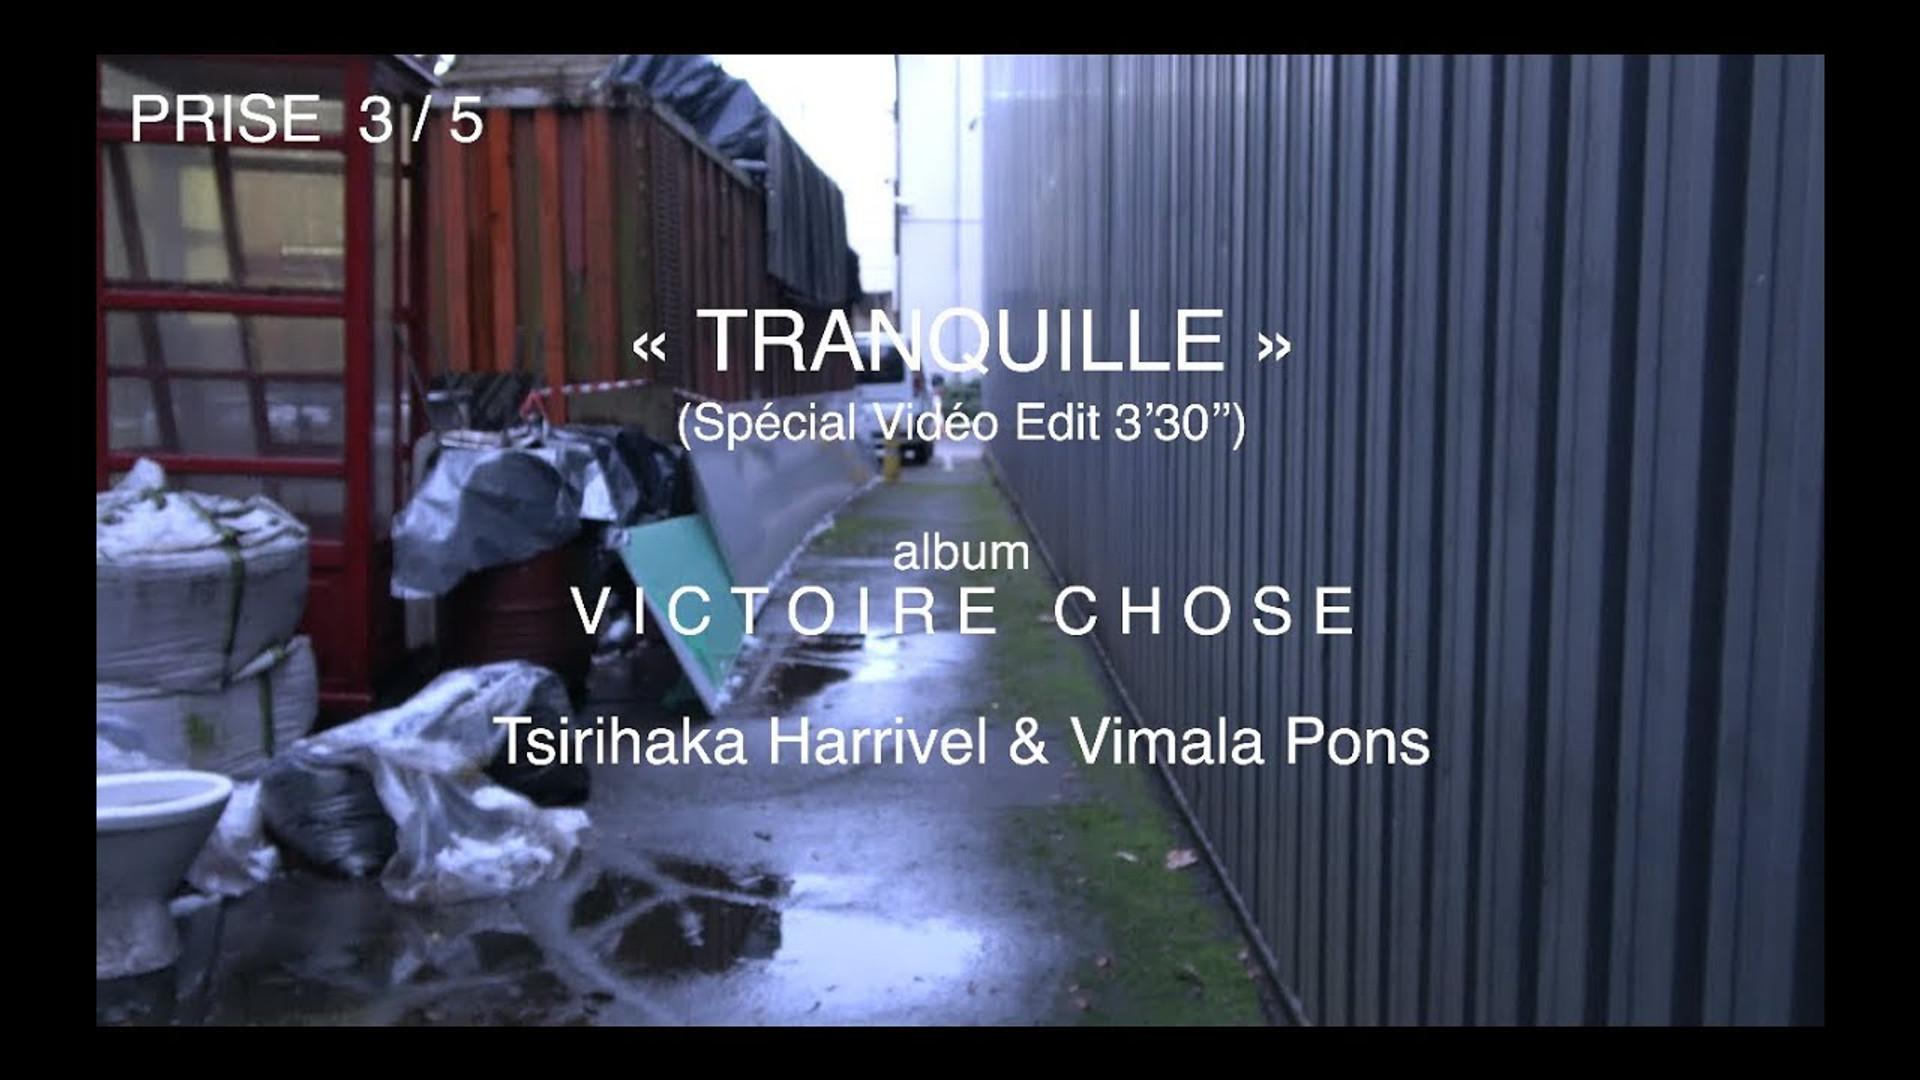 TRANQUILLE, video edit